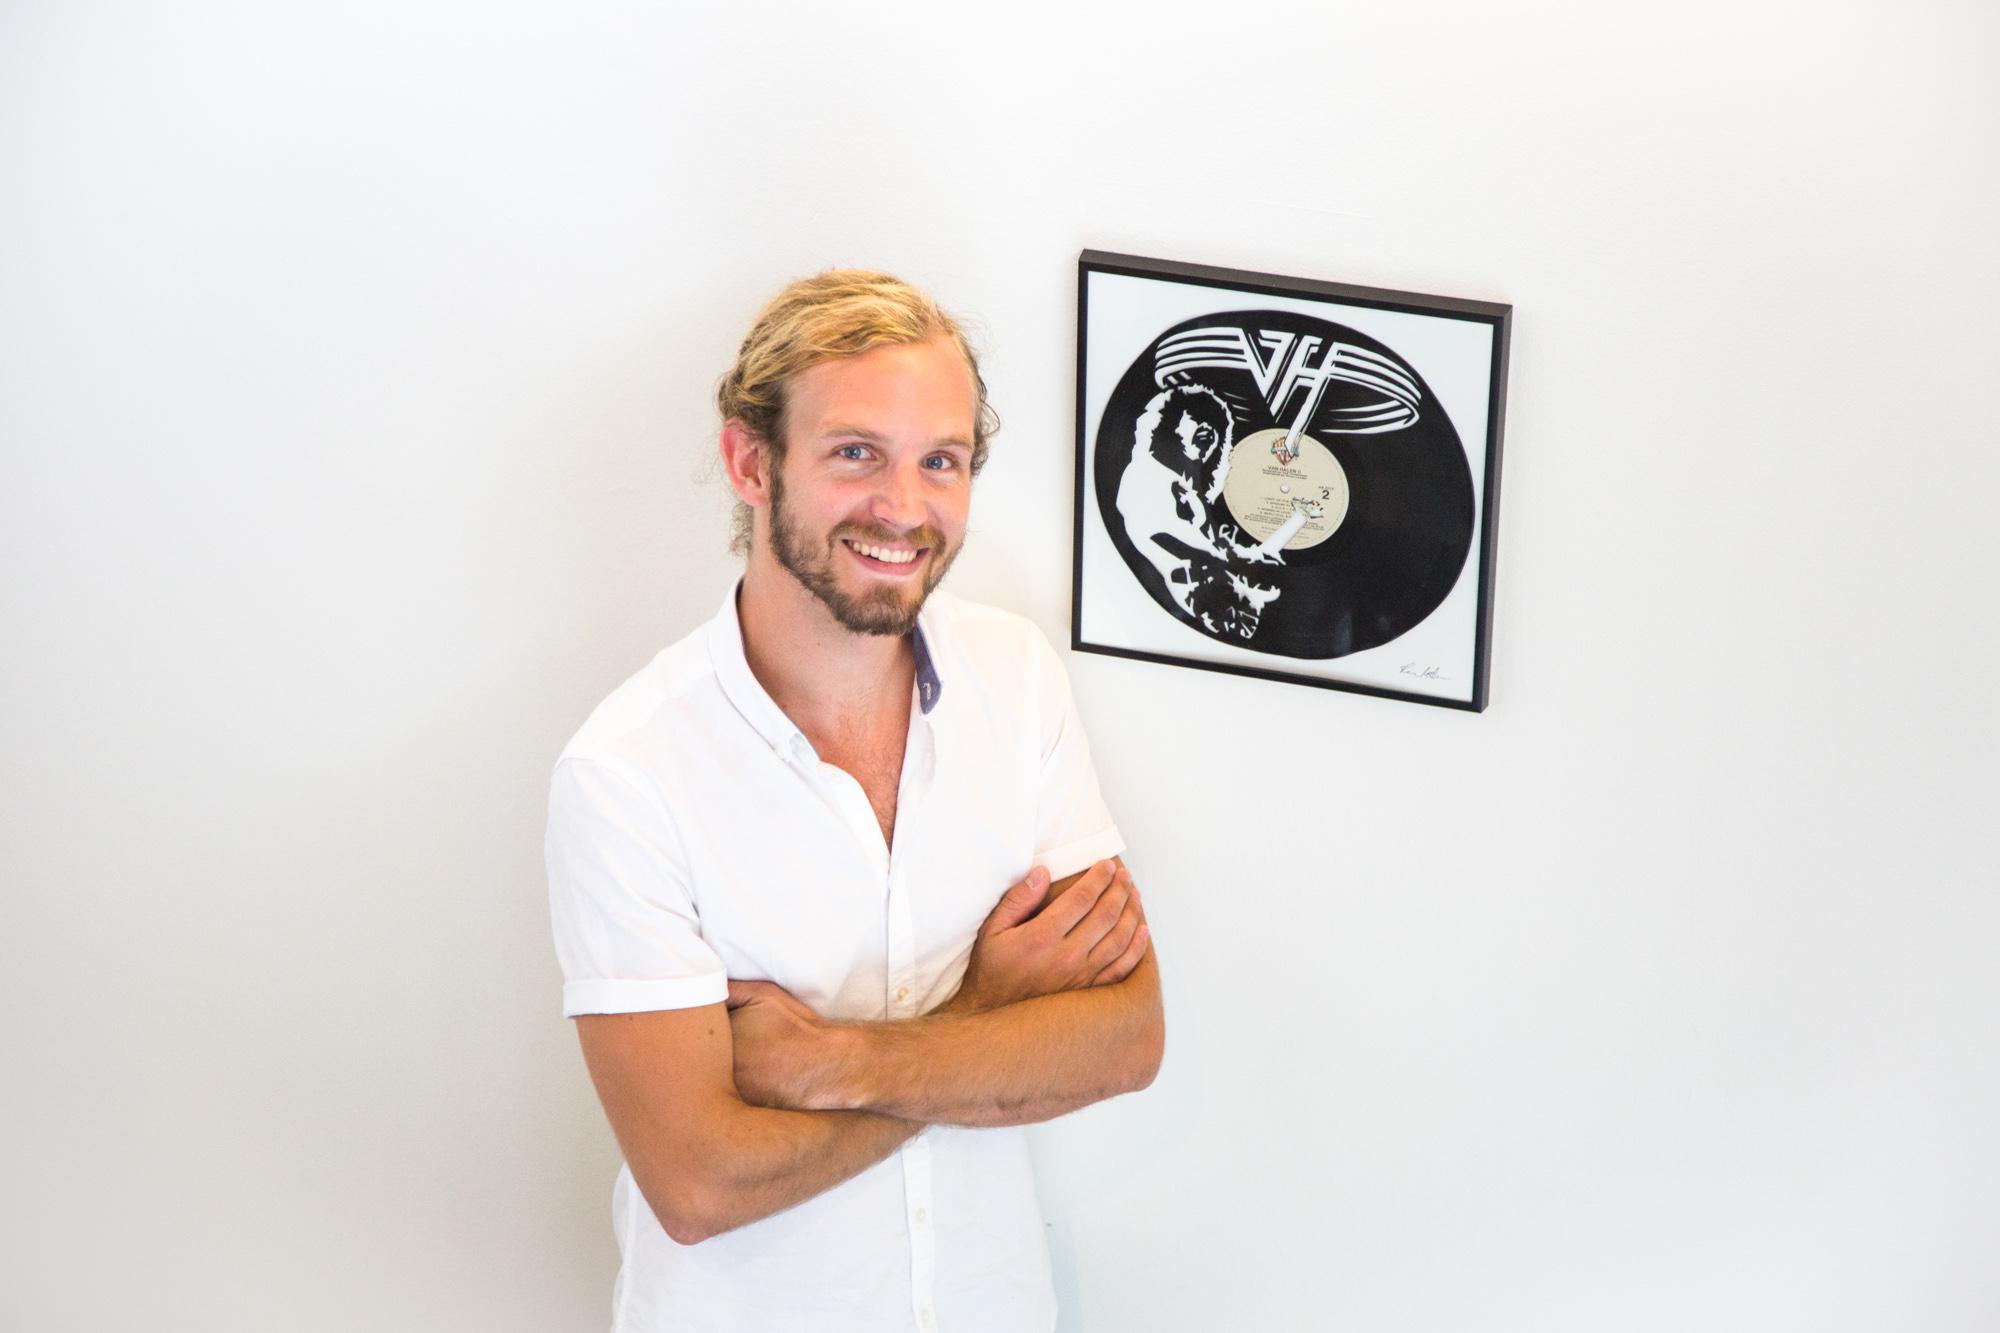 Maker Spotlight: Shawn McClure